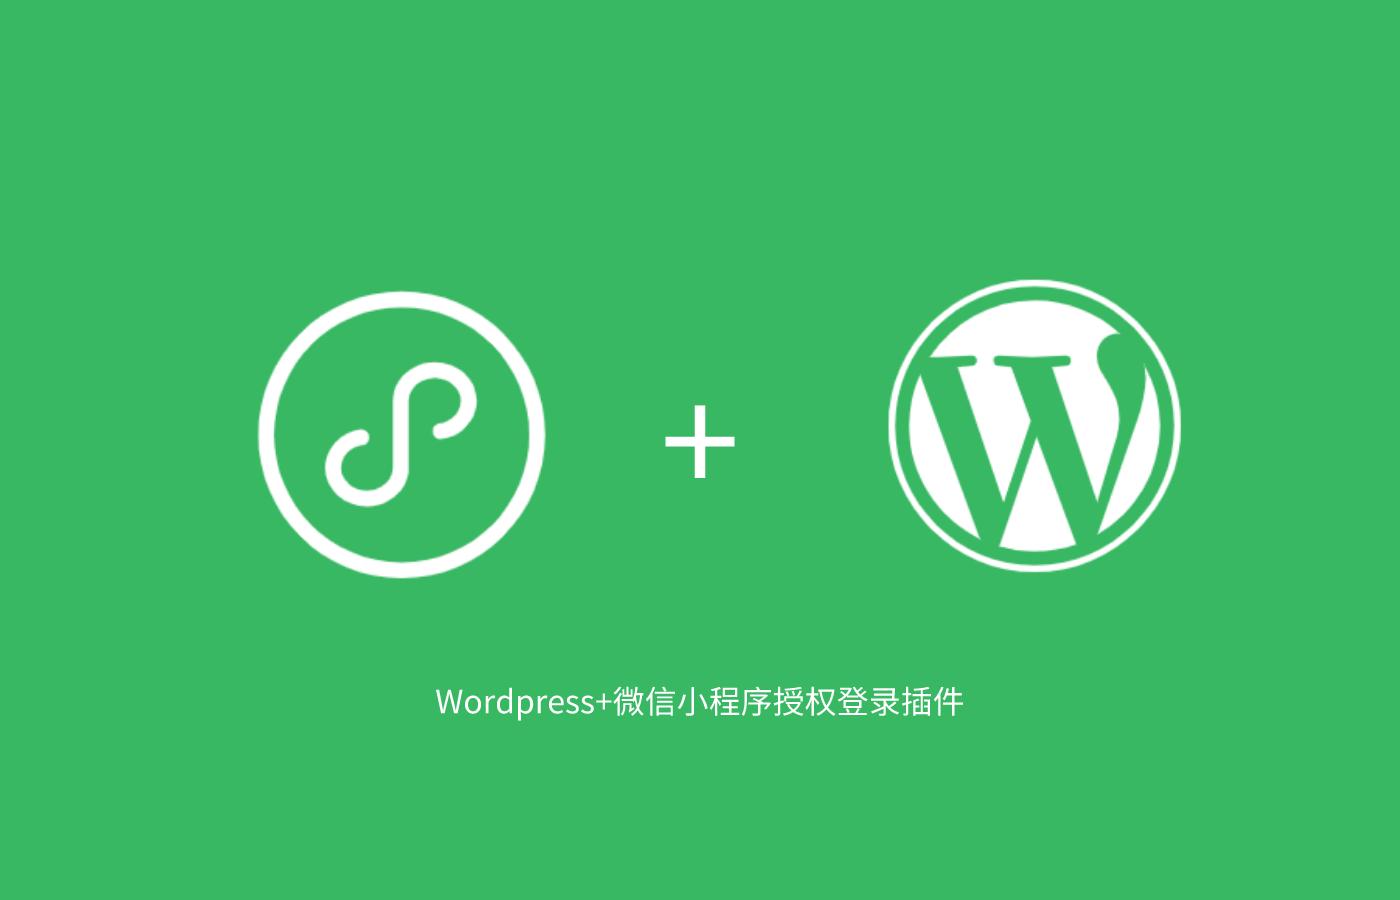 Wordpress小程序授权登录插件